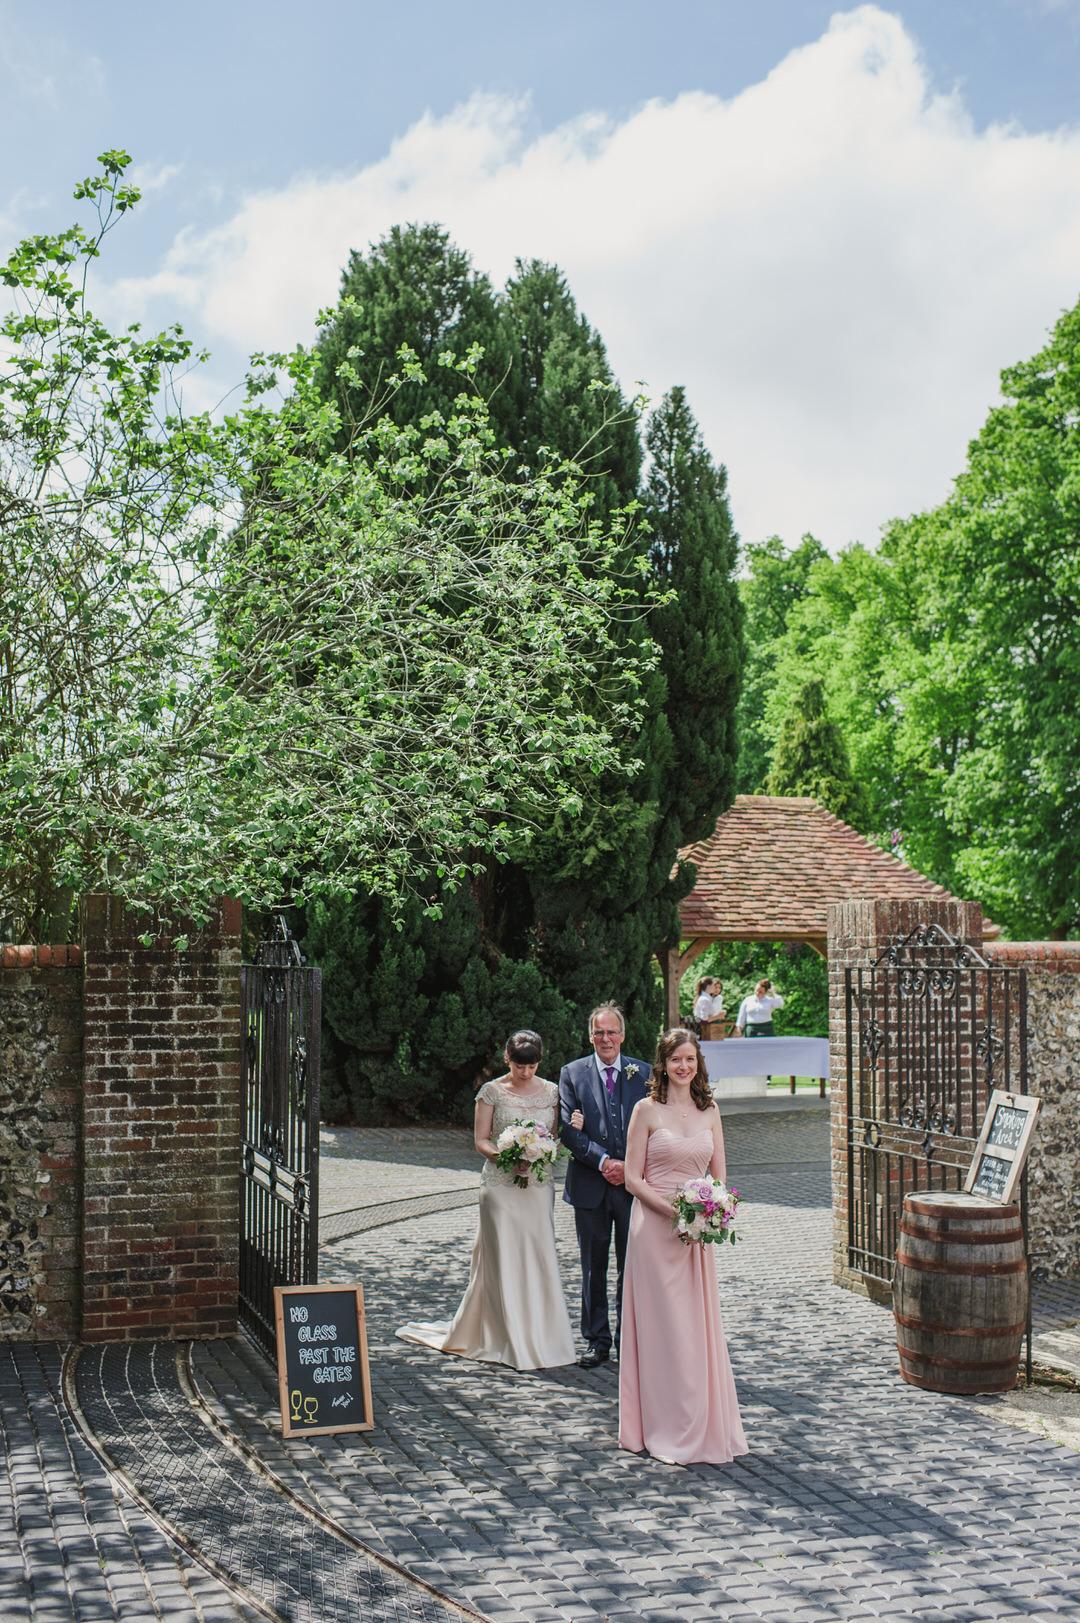 Karen-Flower-Herons-Farm-wedding-1036